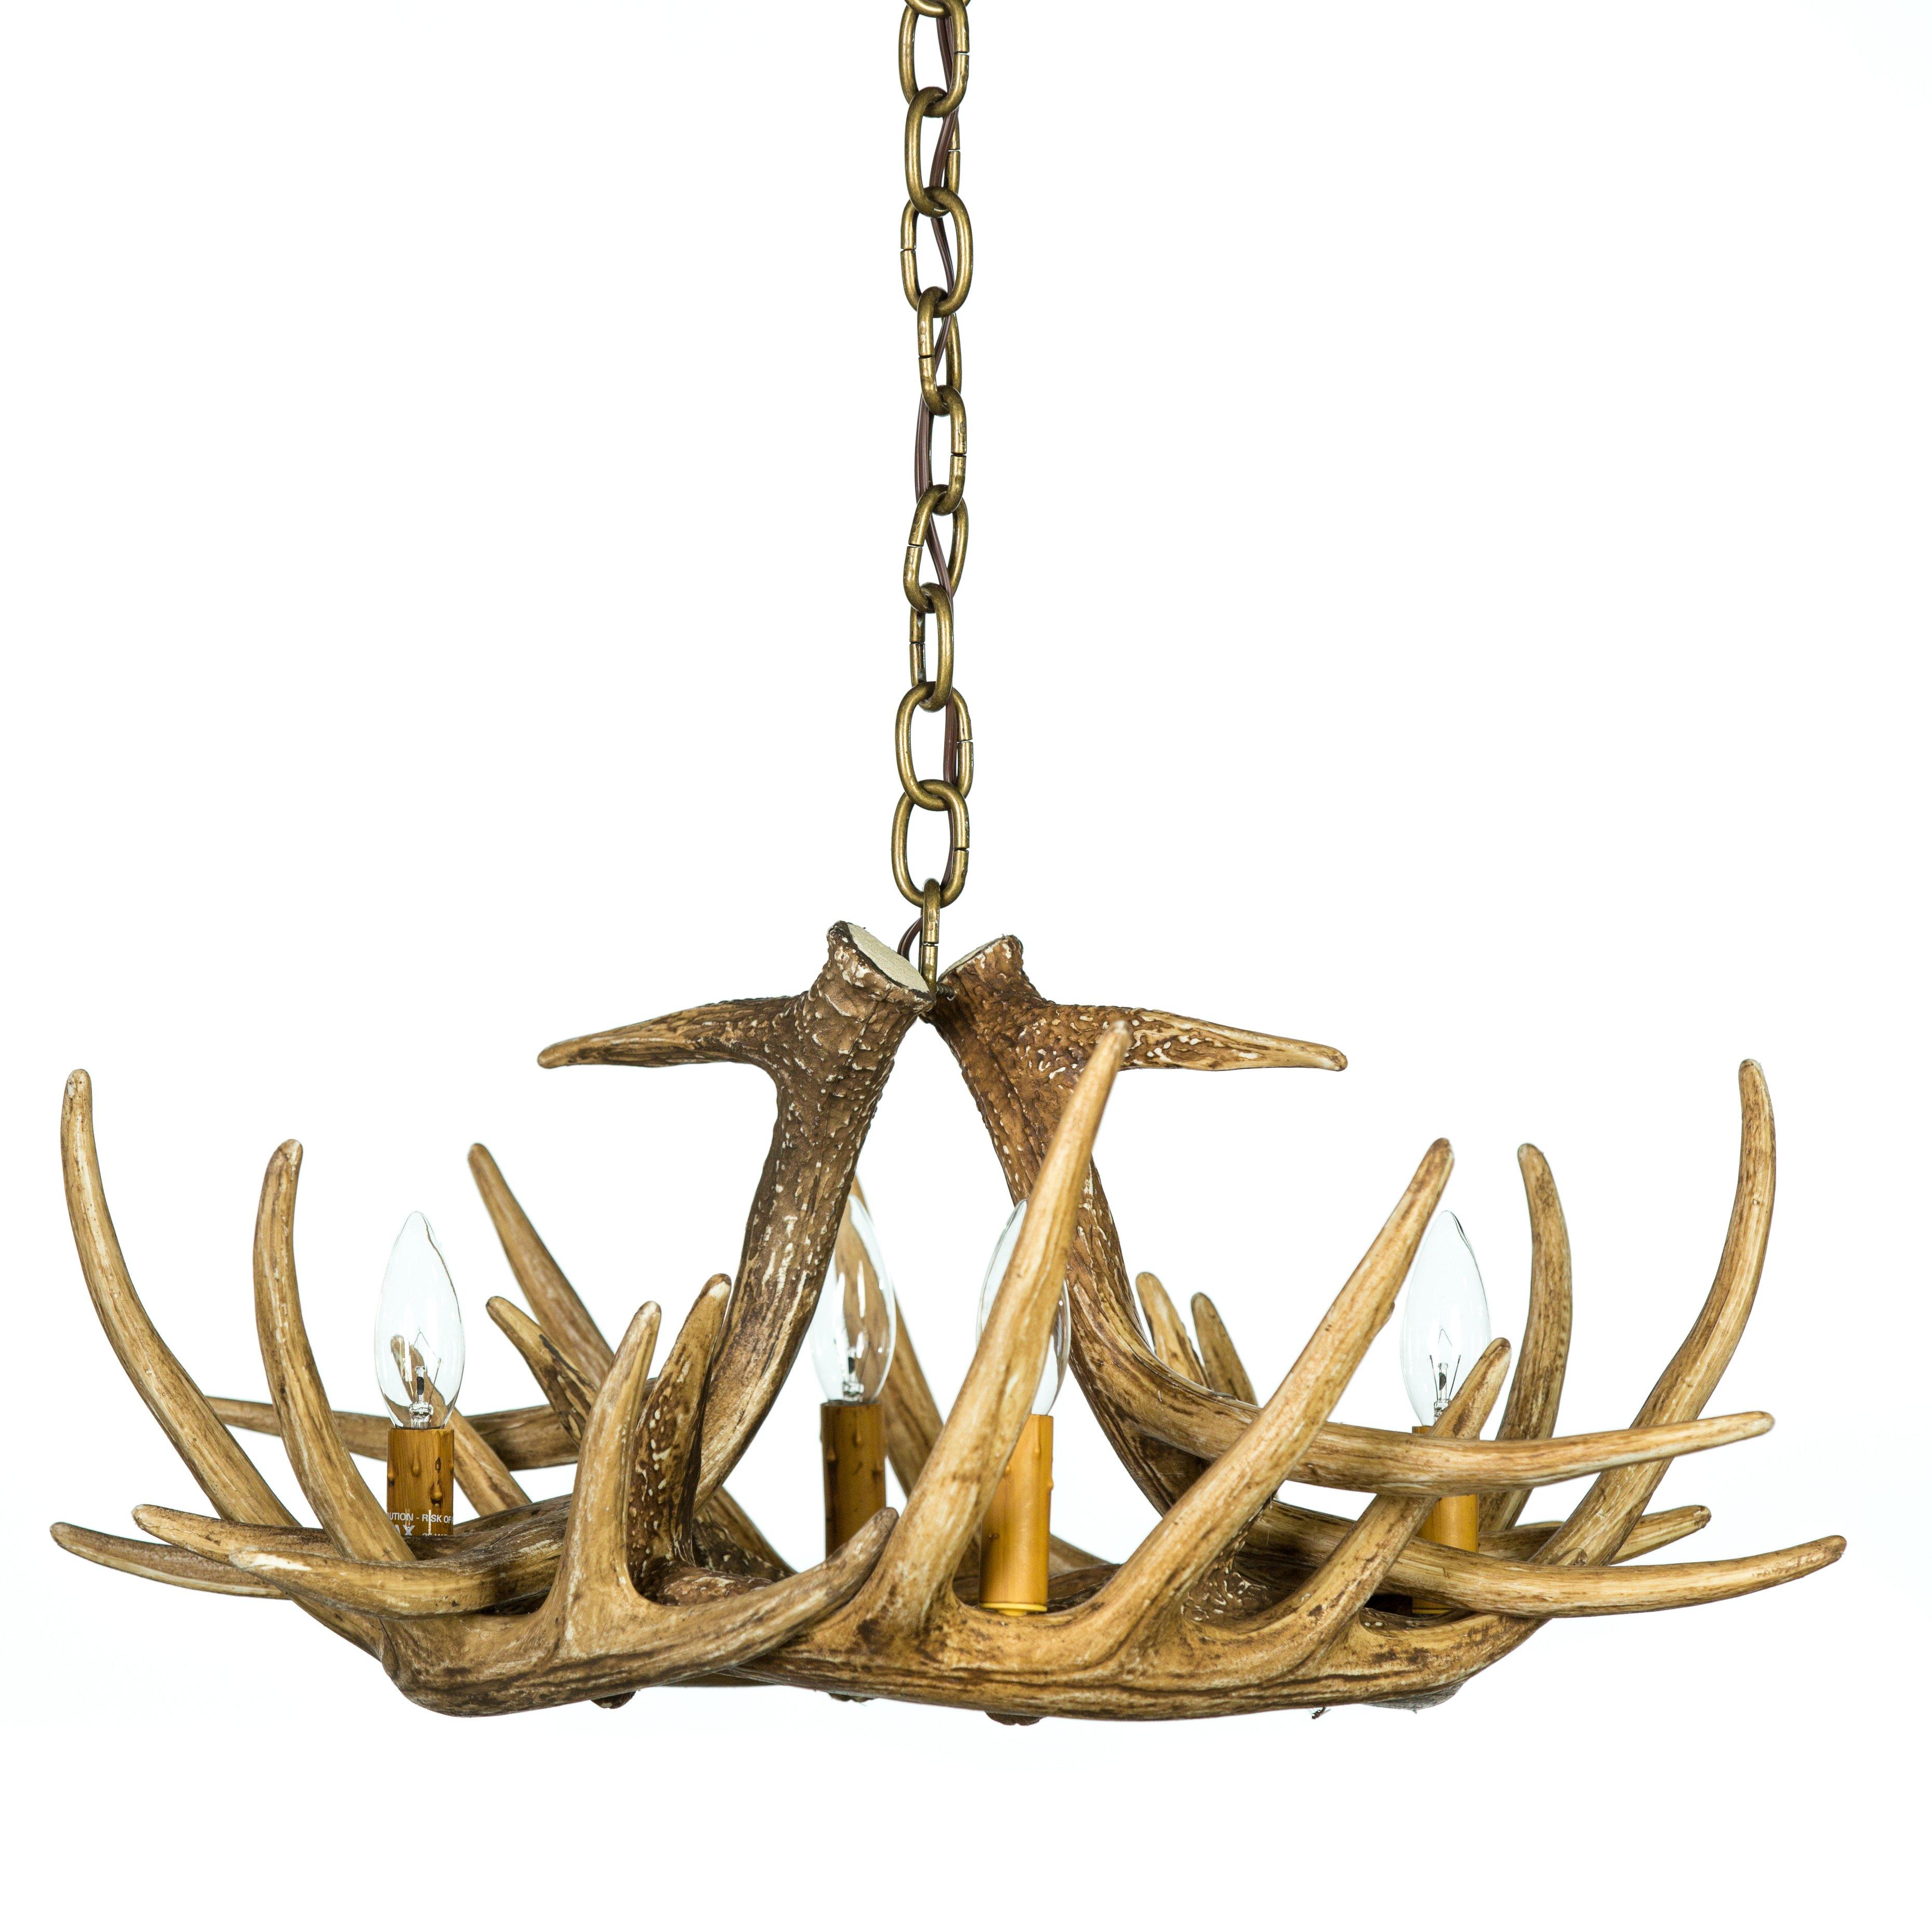 Whitetail deer 6 antler chandelier cast horn designs aloadofball Images